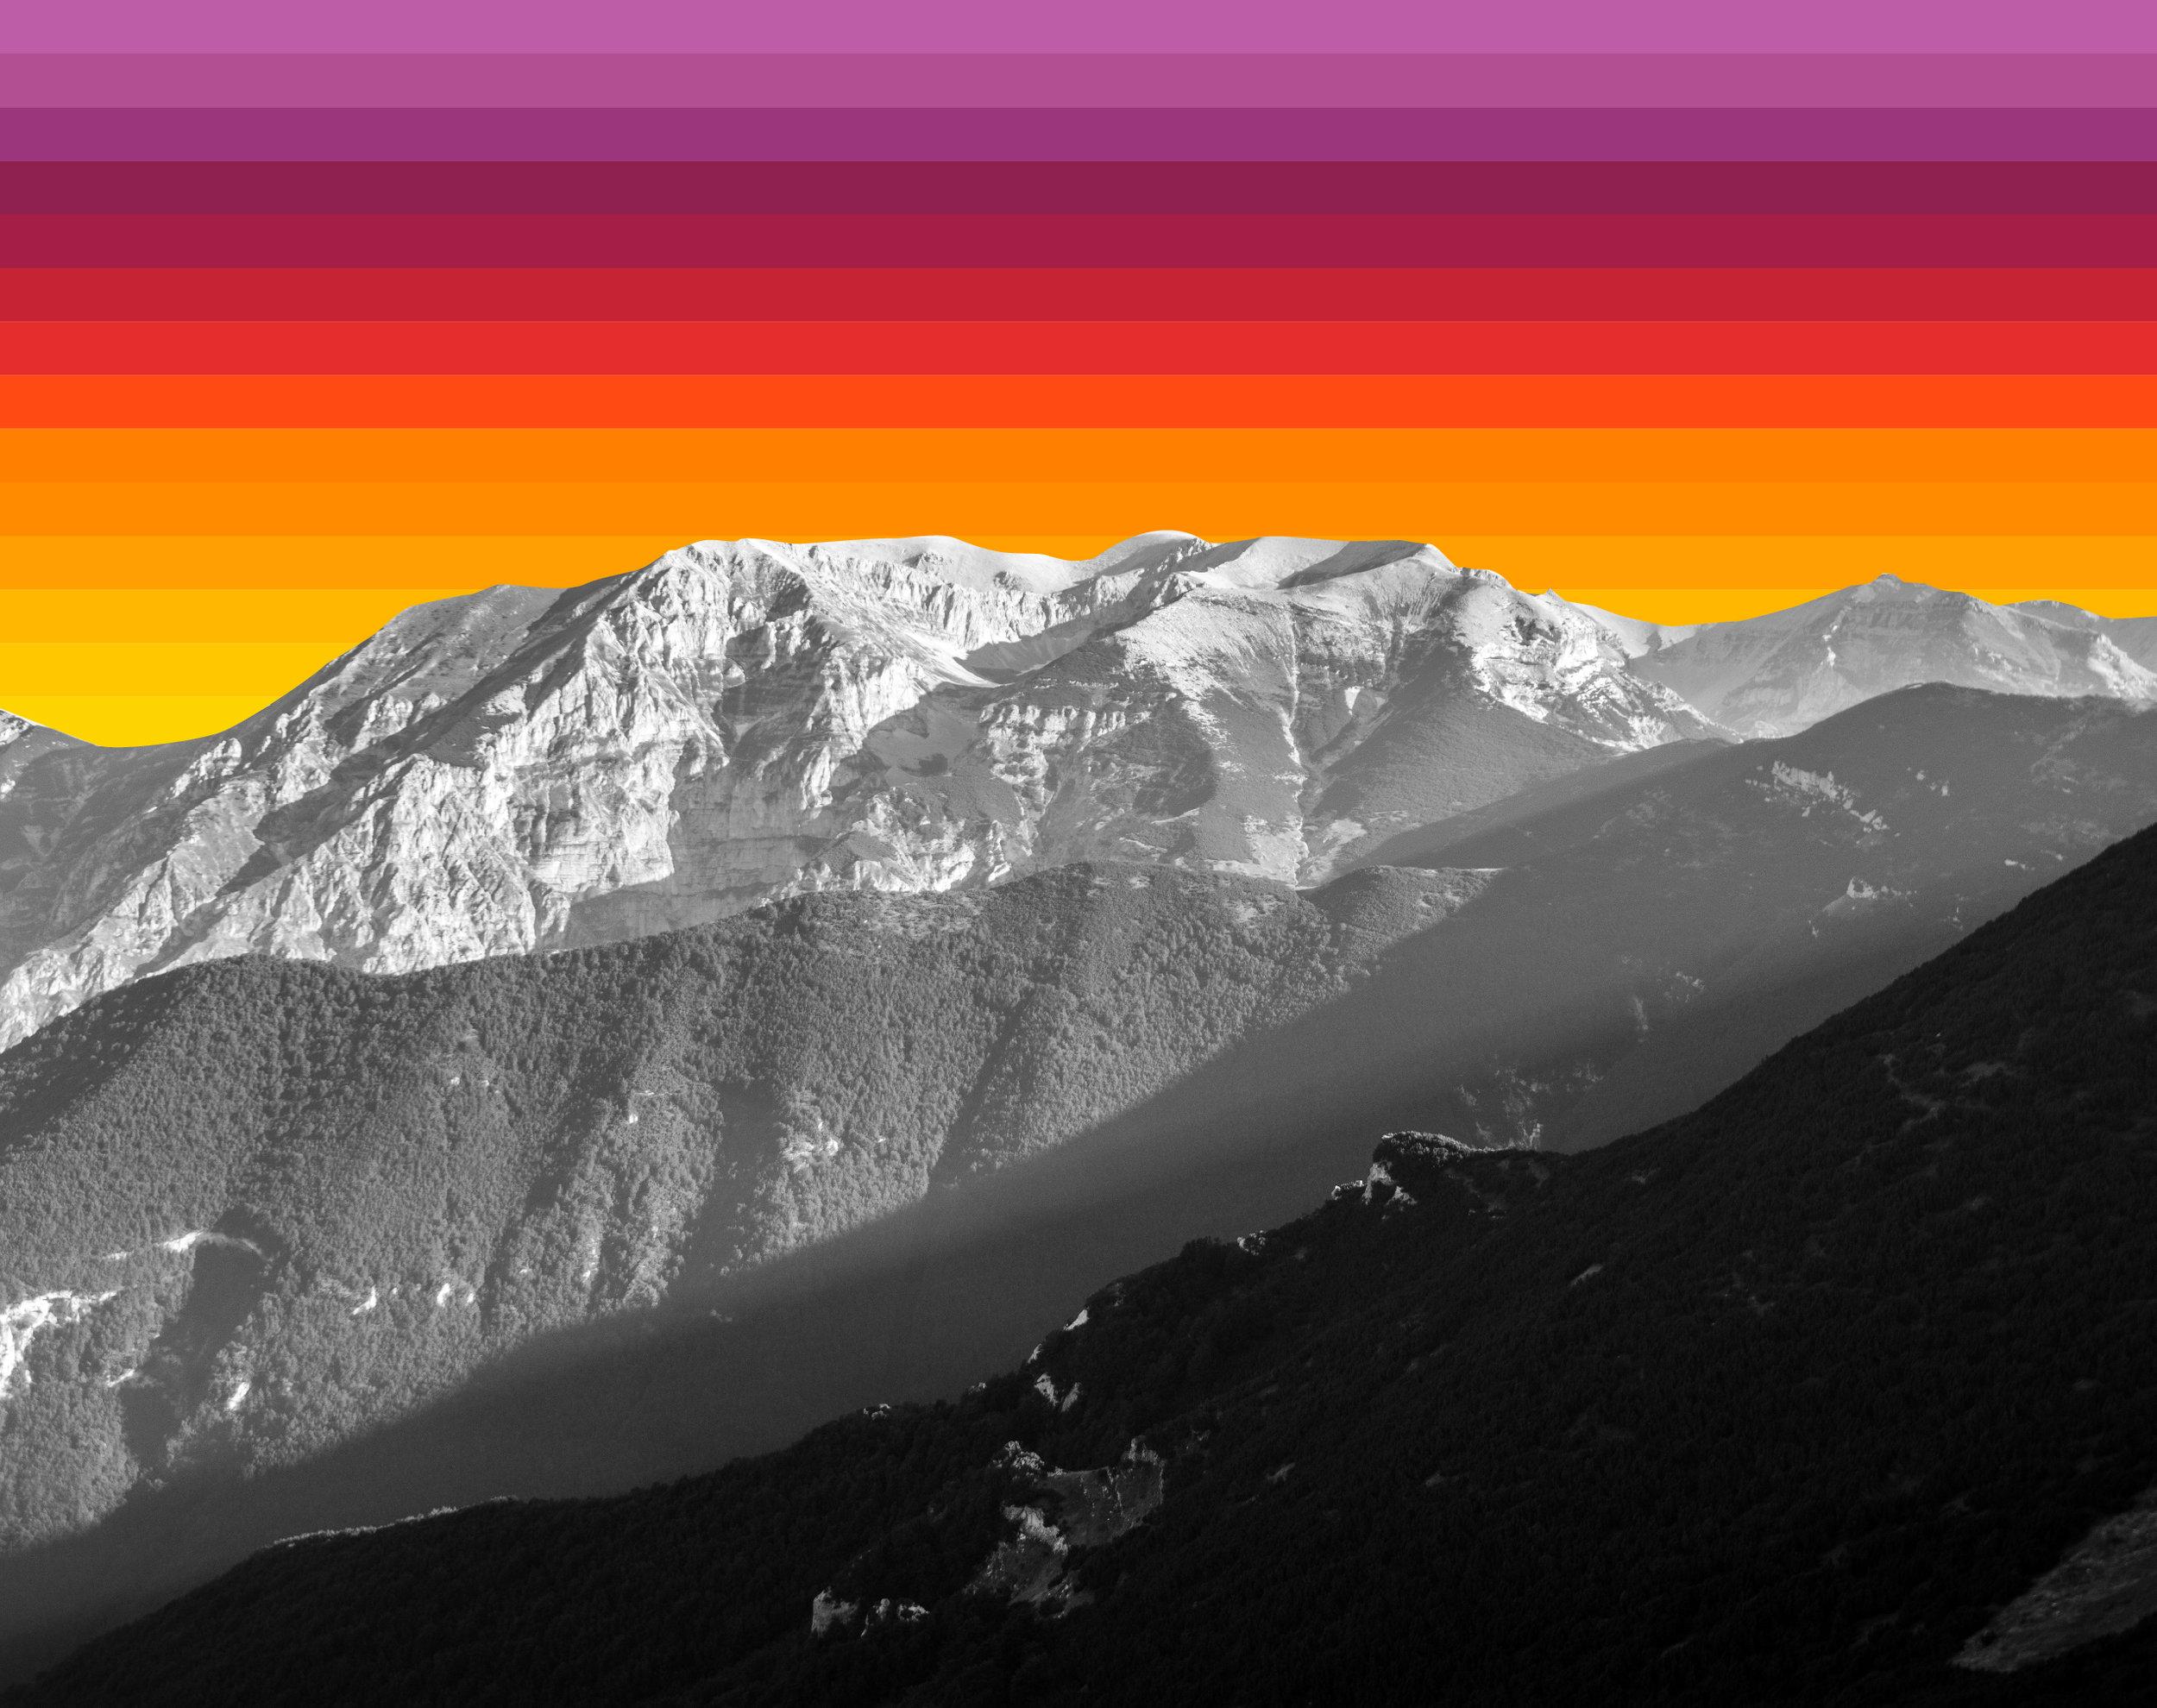 mountains-02.jpg